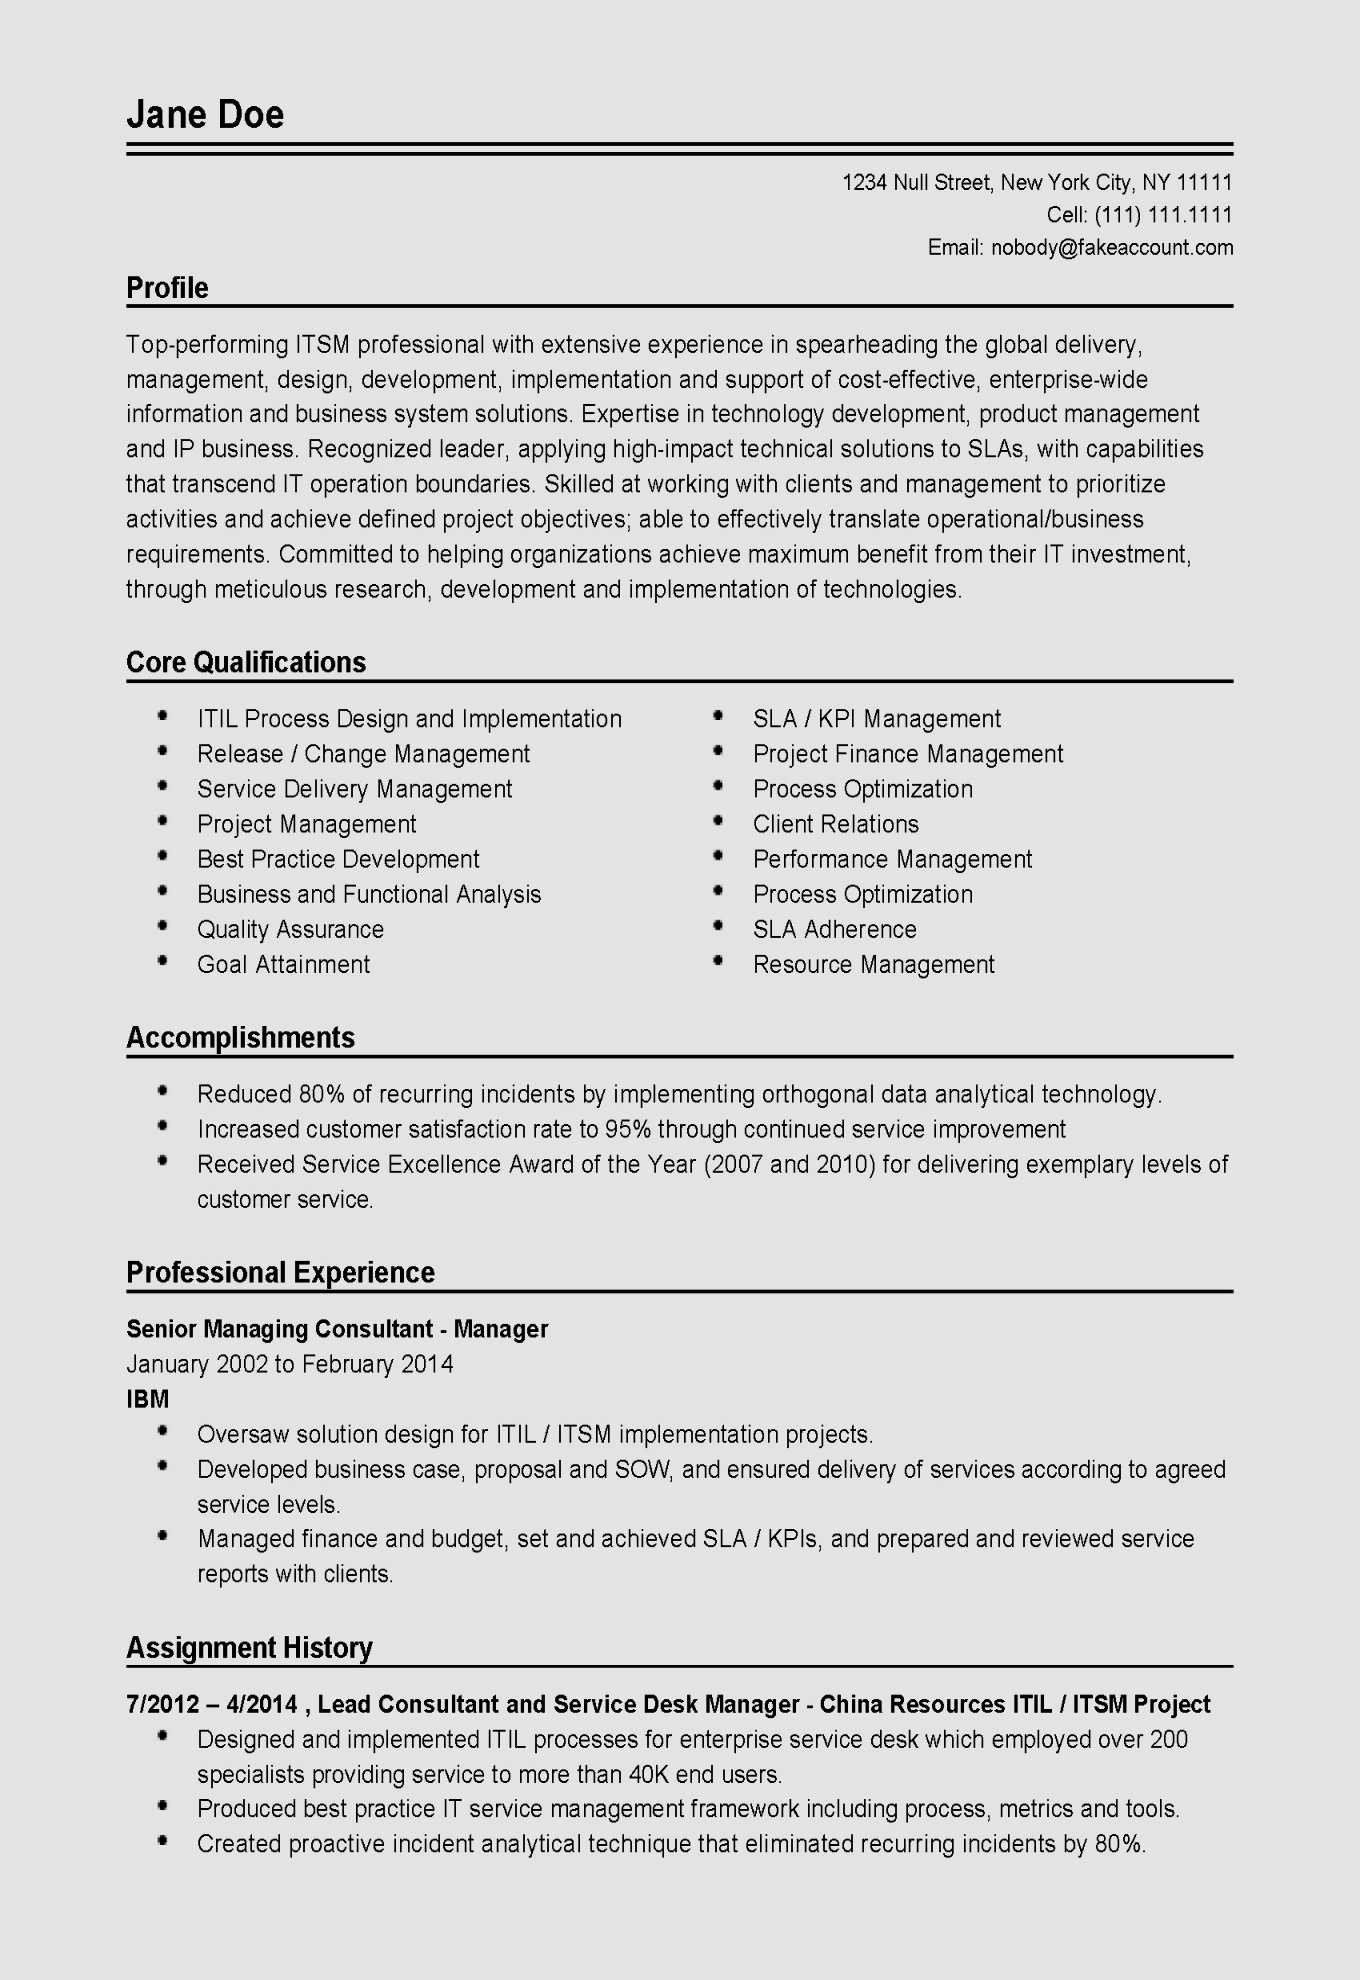 Core Java Developer Resume Inspirational User Interface Developer Resume Luxury Front End Resume Examples Resume Cover Letter Examples Cover Letter For Resume